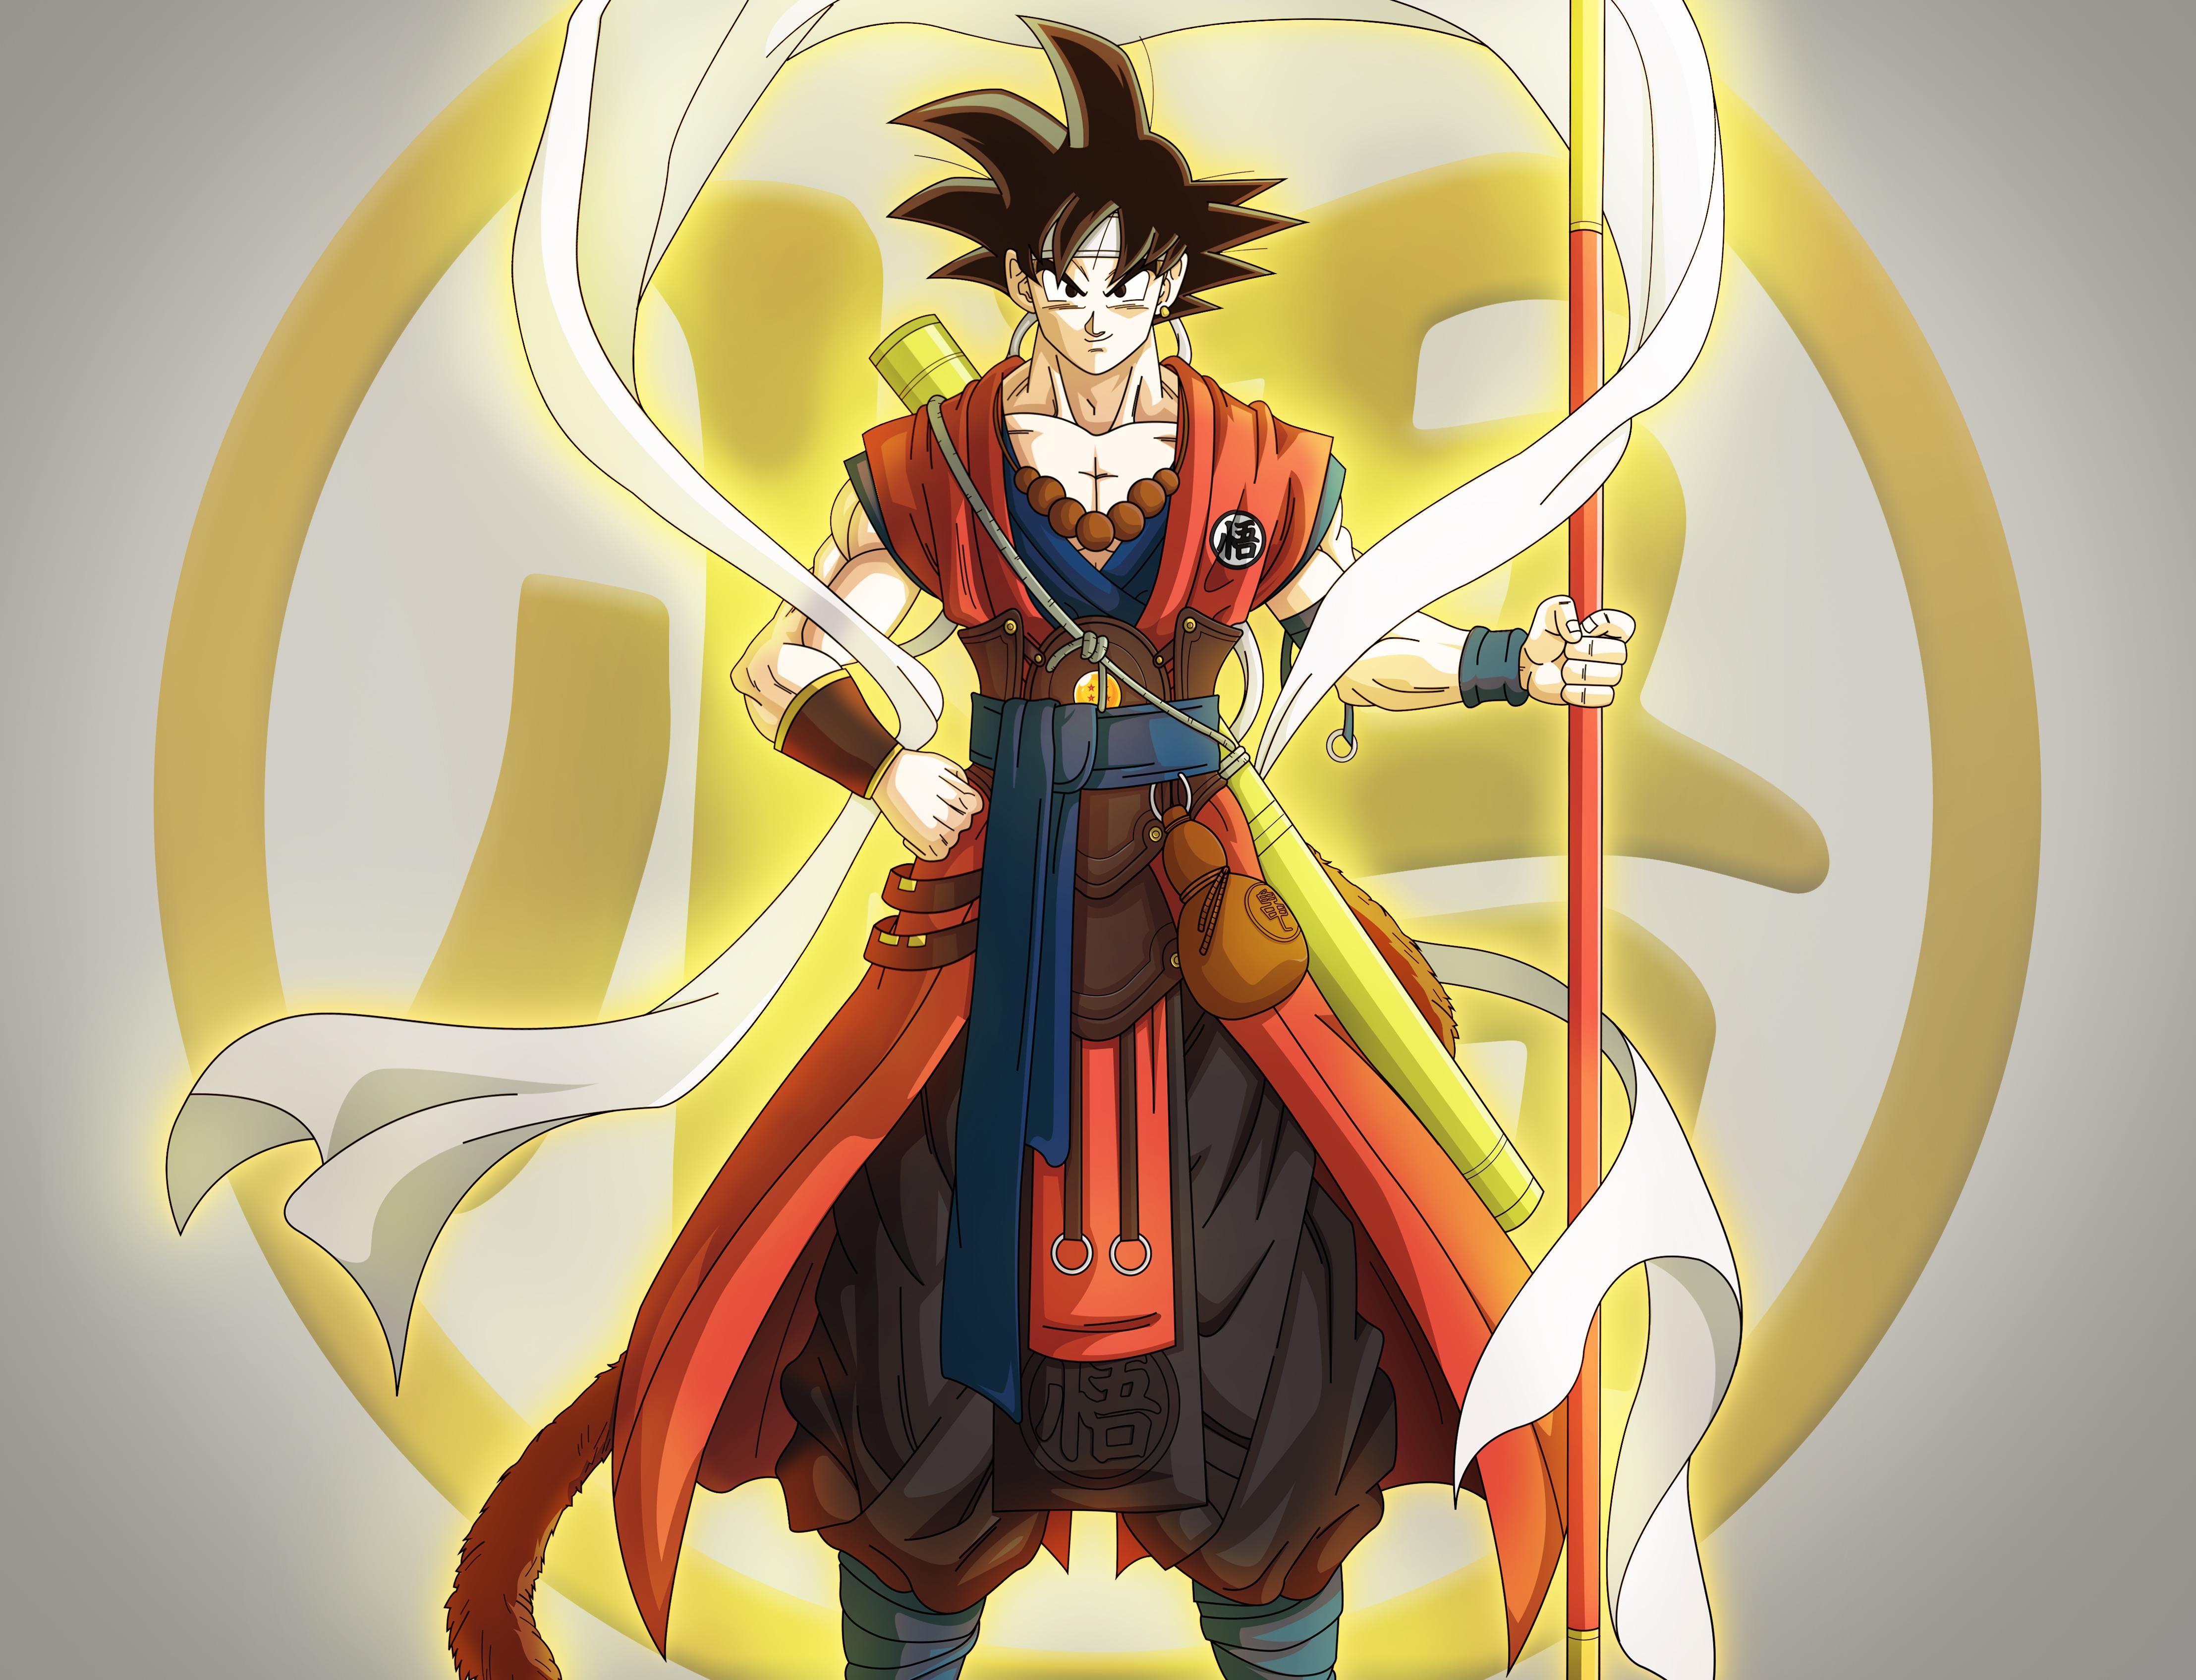 Goku 4k Ultra Hd Wallpaper Background Image 4431x3390 Id 1008129 Wallpaper Abyss